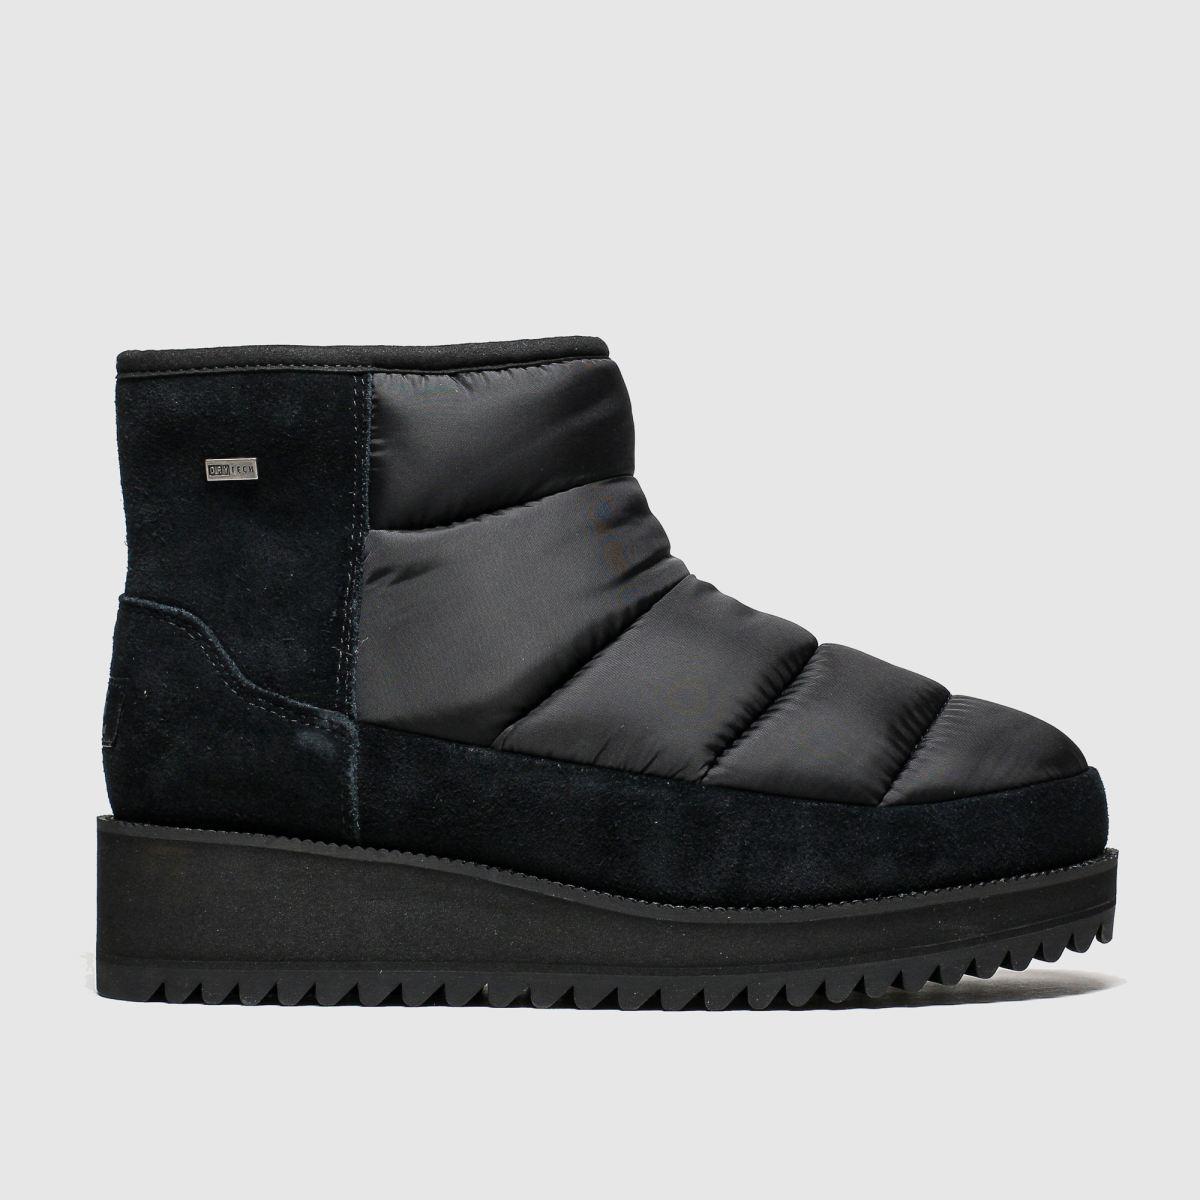 Ugg Black Ridge Mini Boots